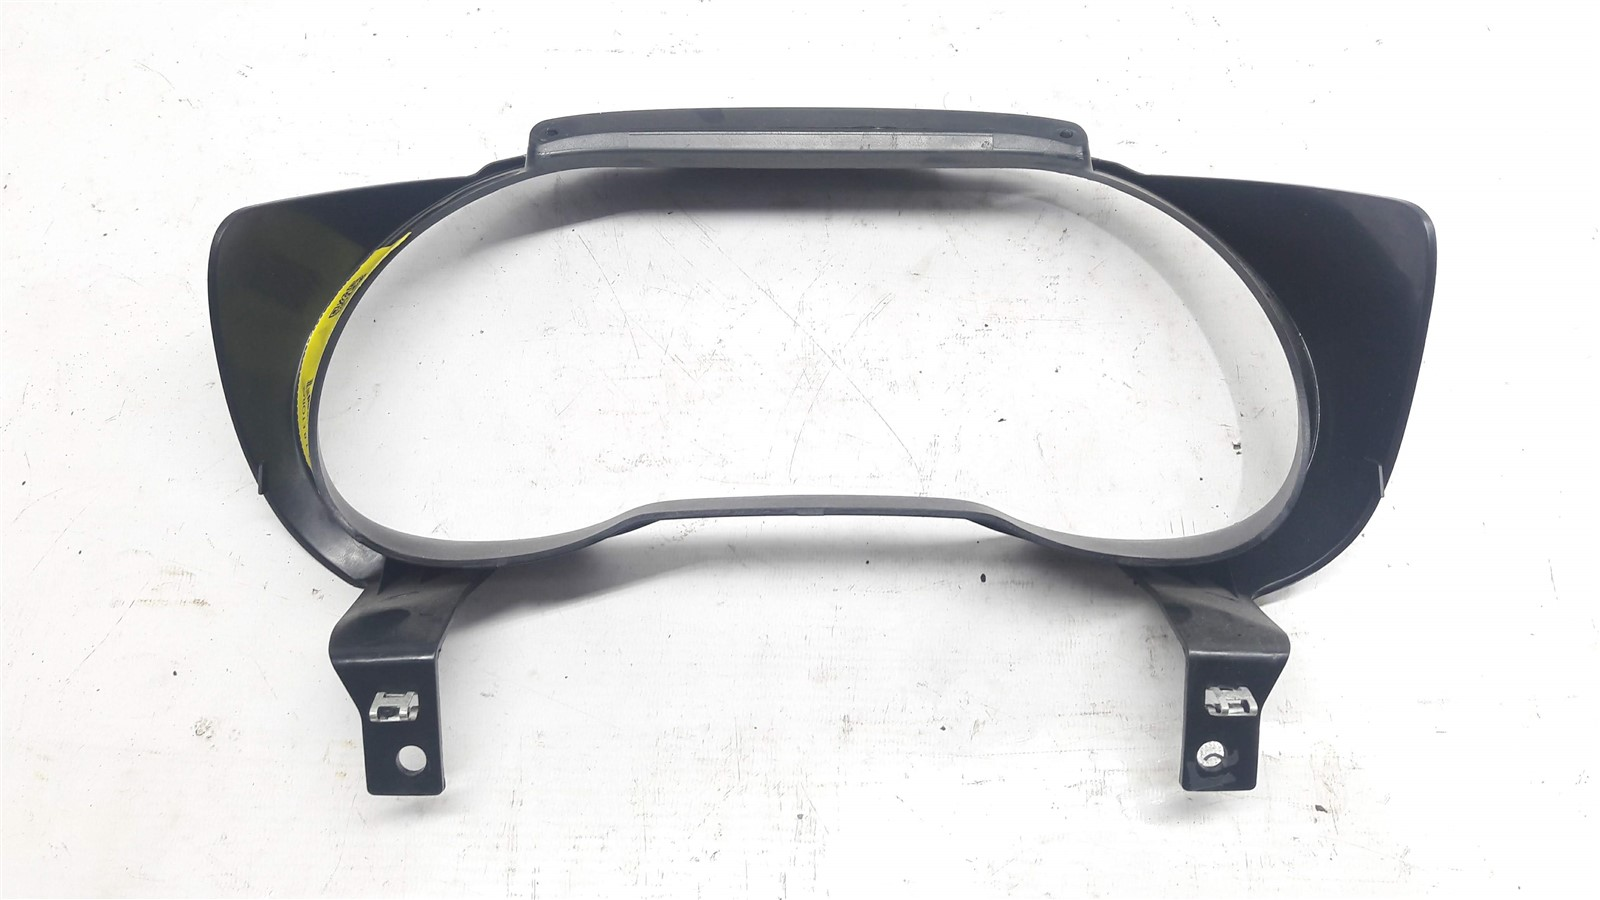 Moldura arco painel instrumentos velocímetro Linea 2008-2012